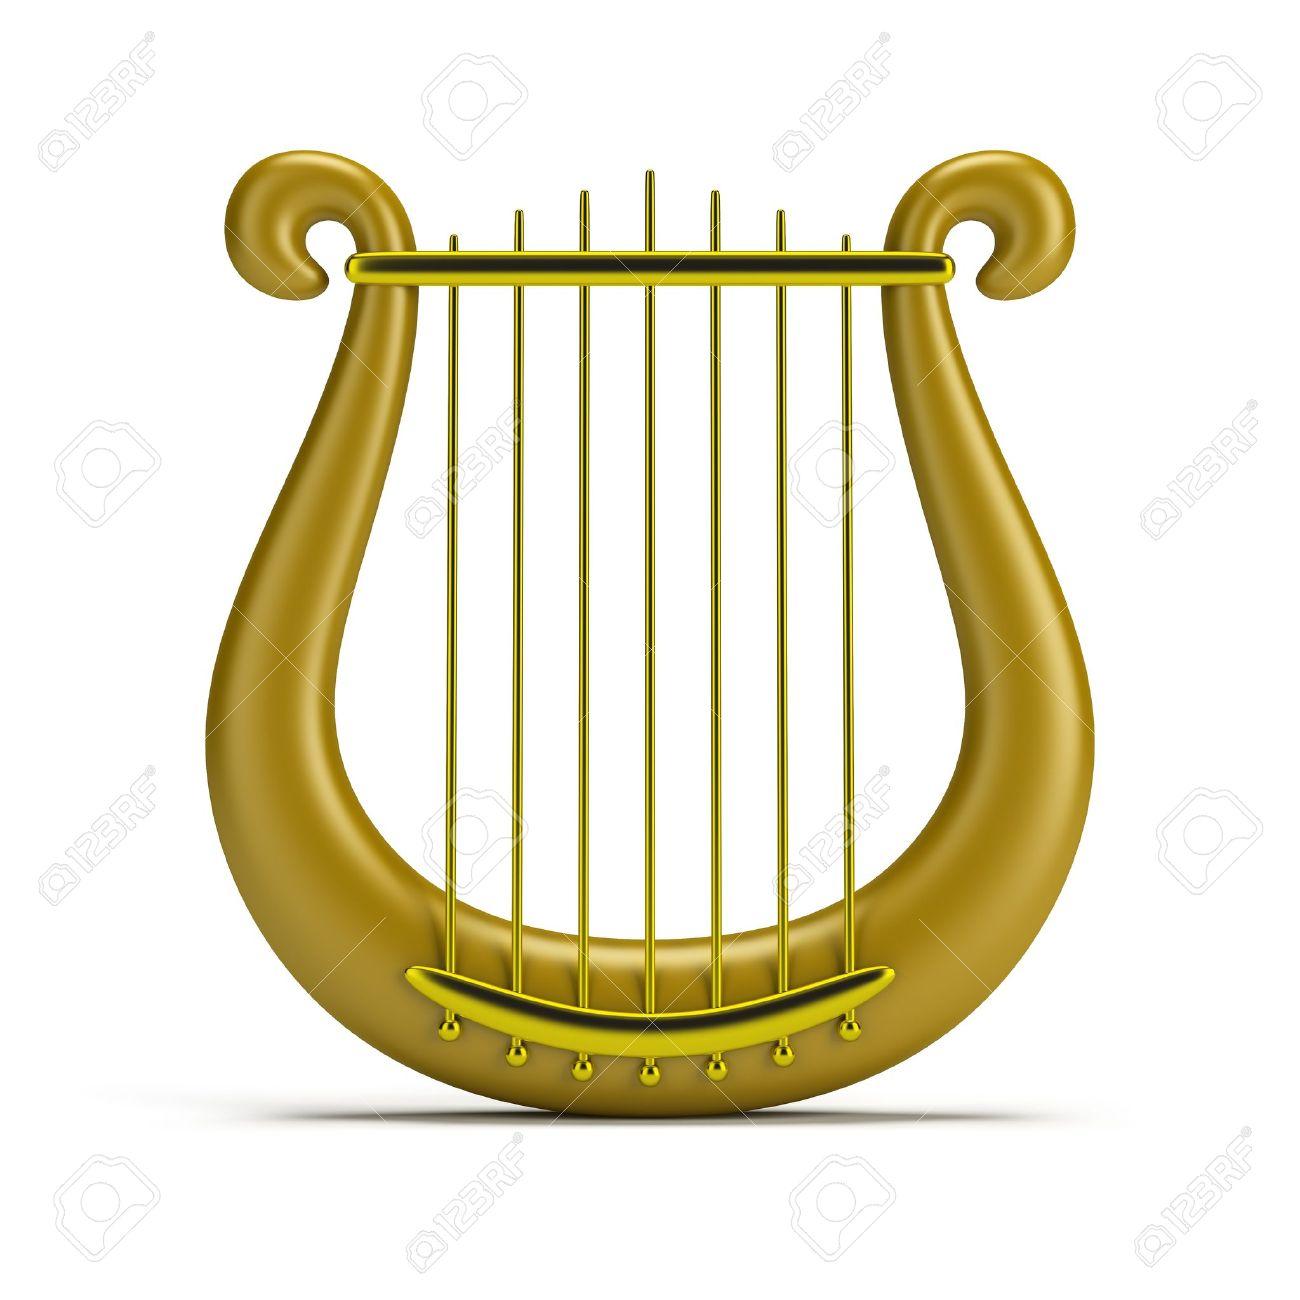 golden harp. 3d image. Isolated white background. - 15066844